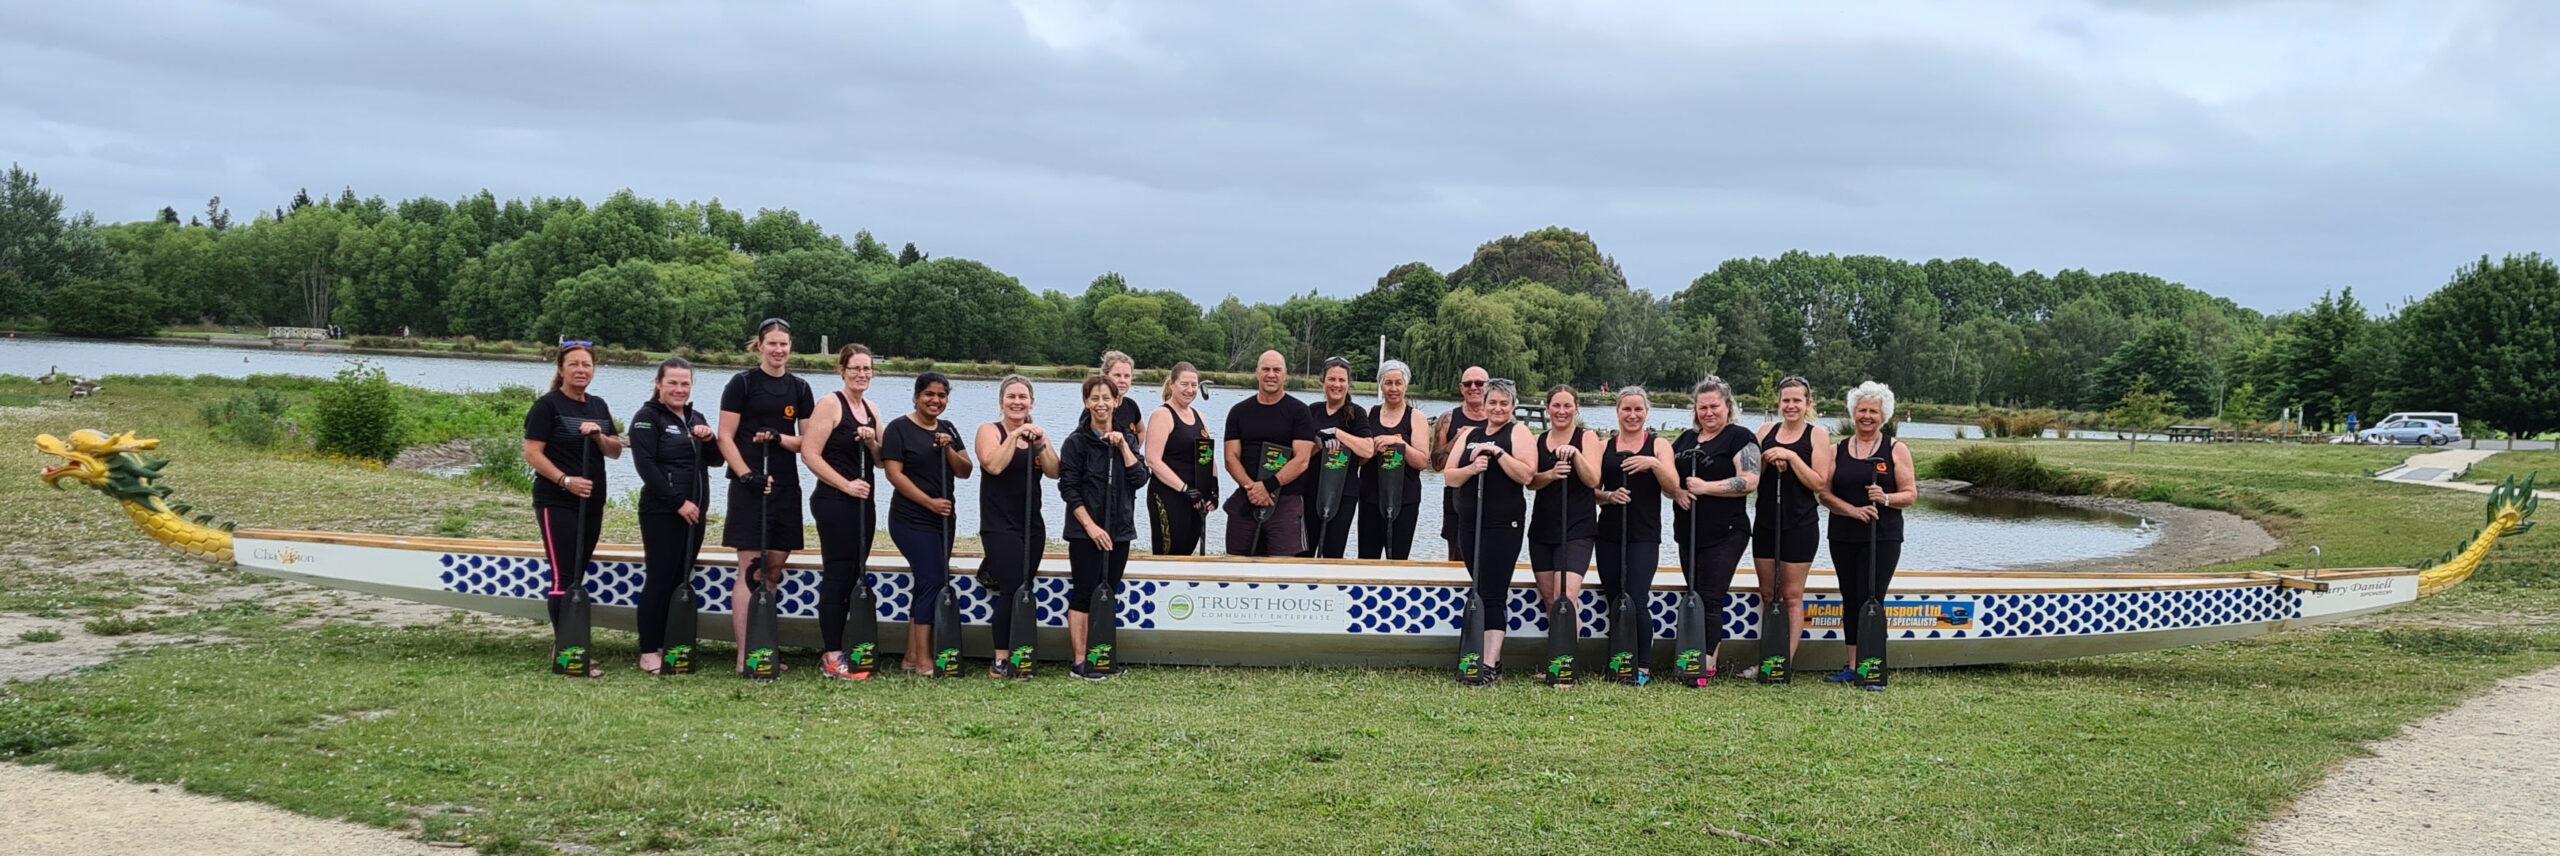 The Wairarapa Dragon Boat Club